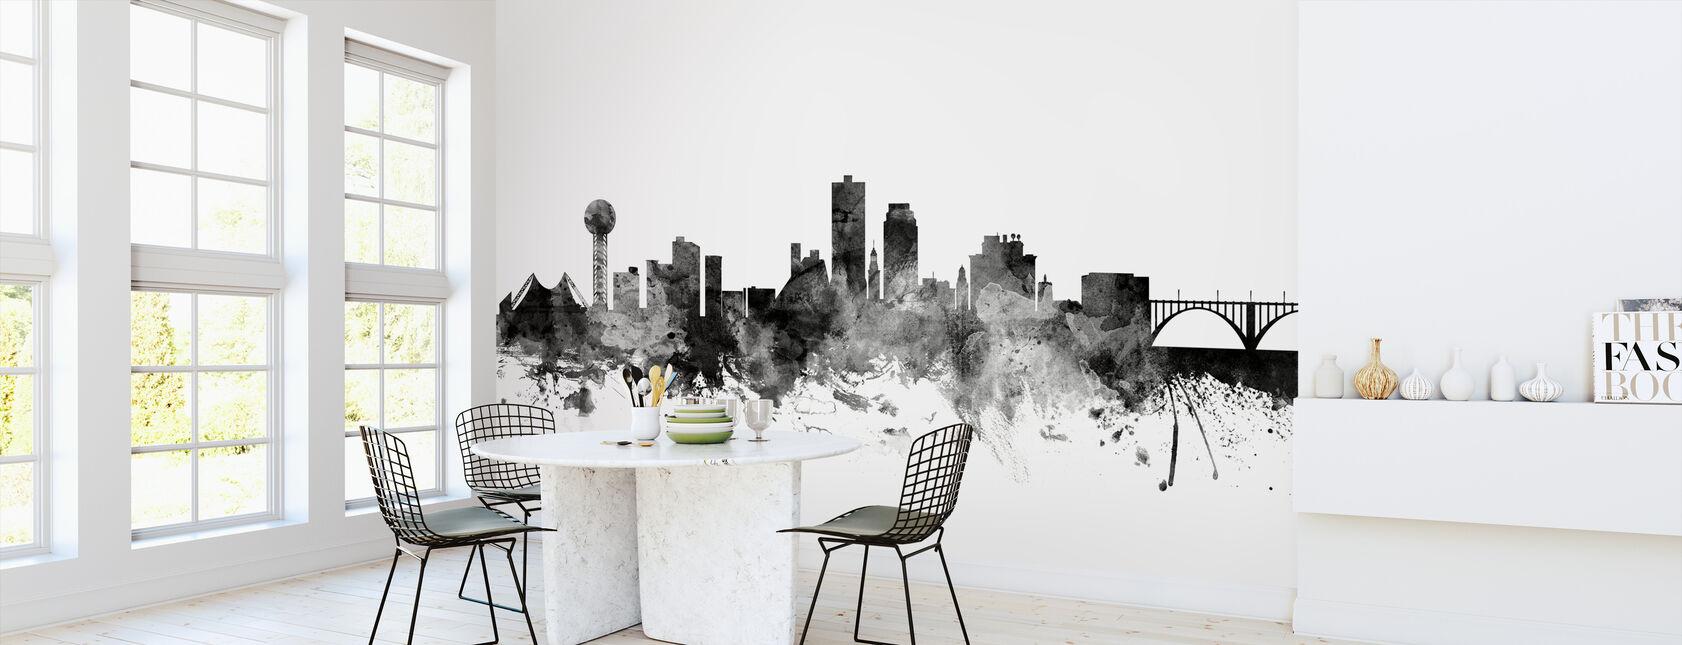 Knoxville Tennessee Skyline Black - Wallpaper - Kitchen